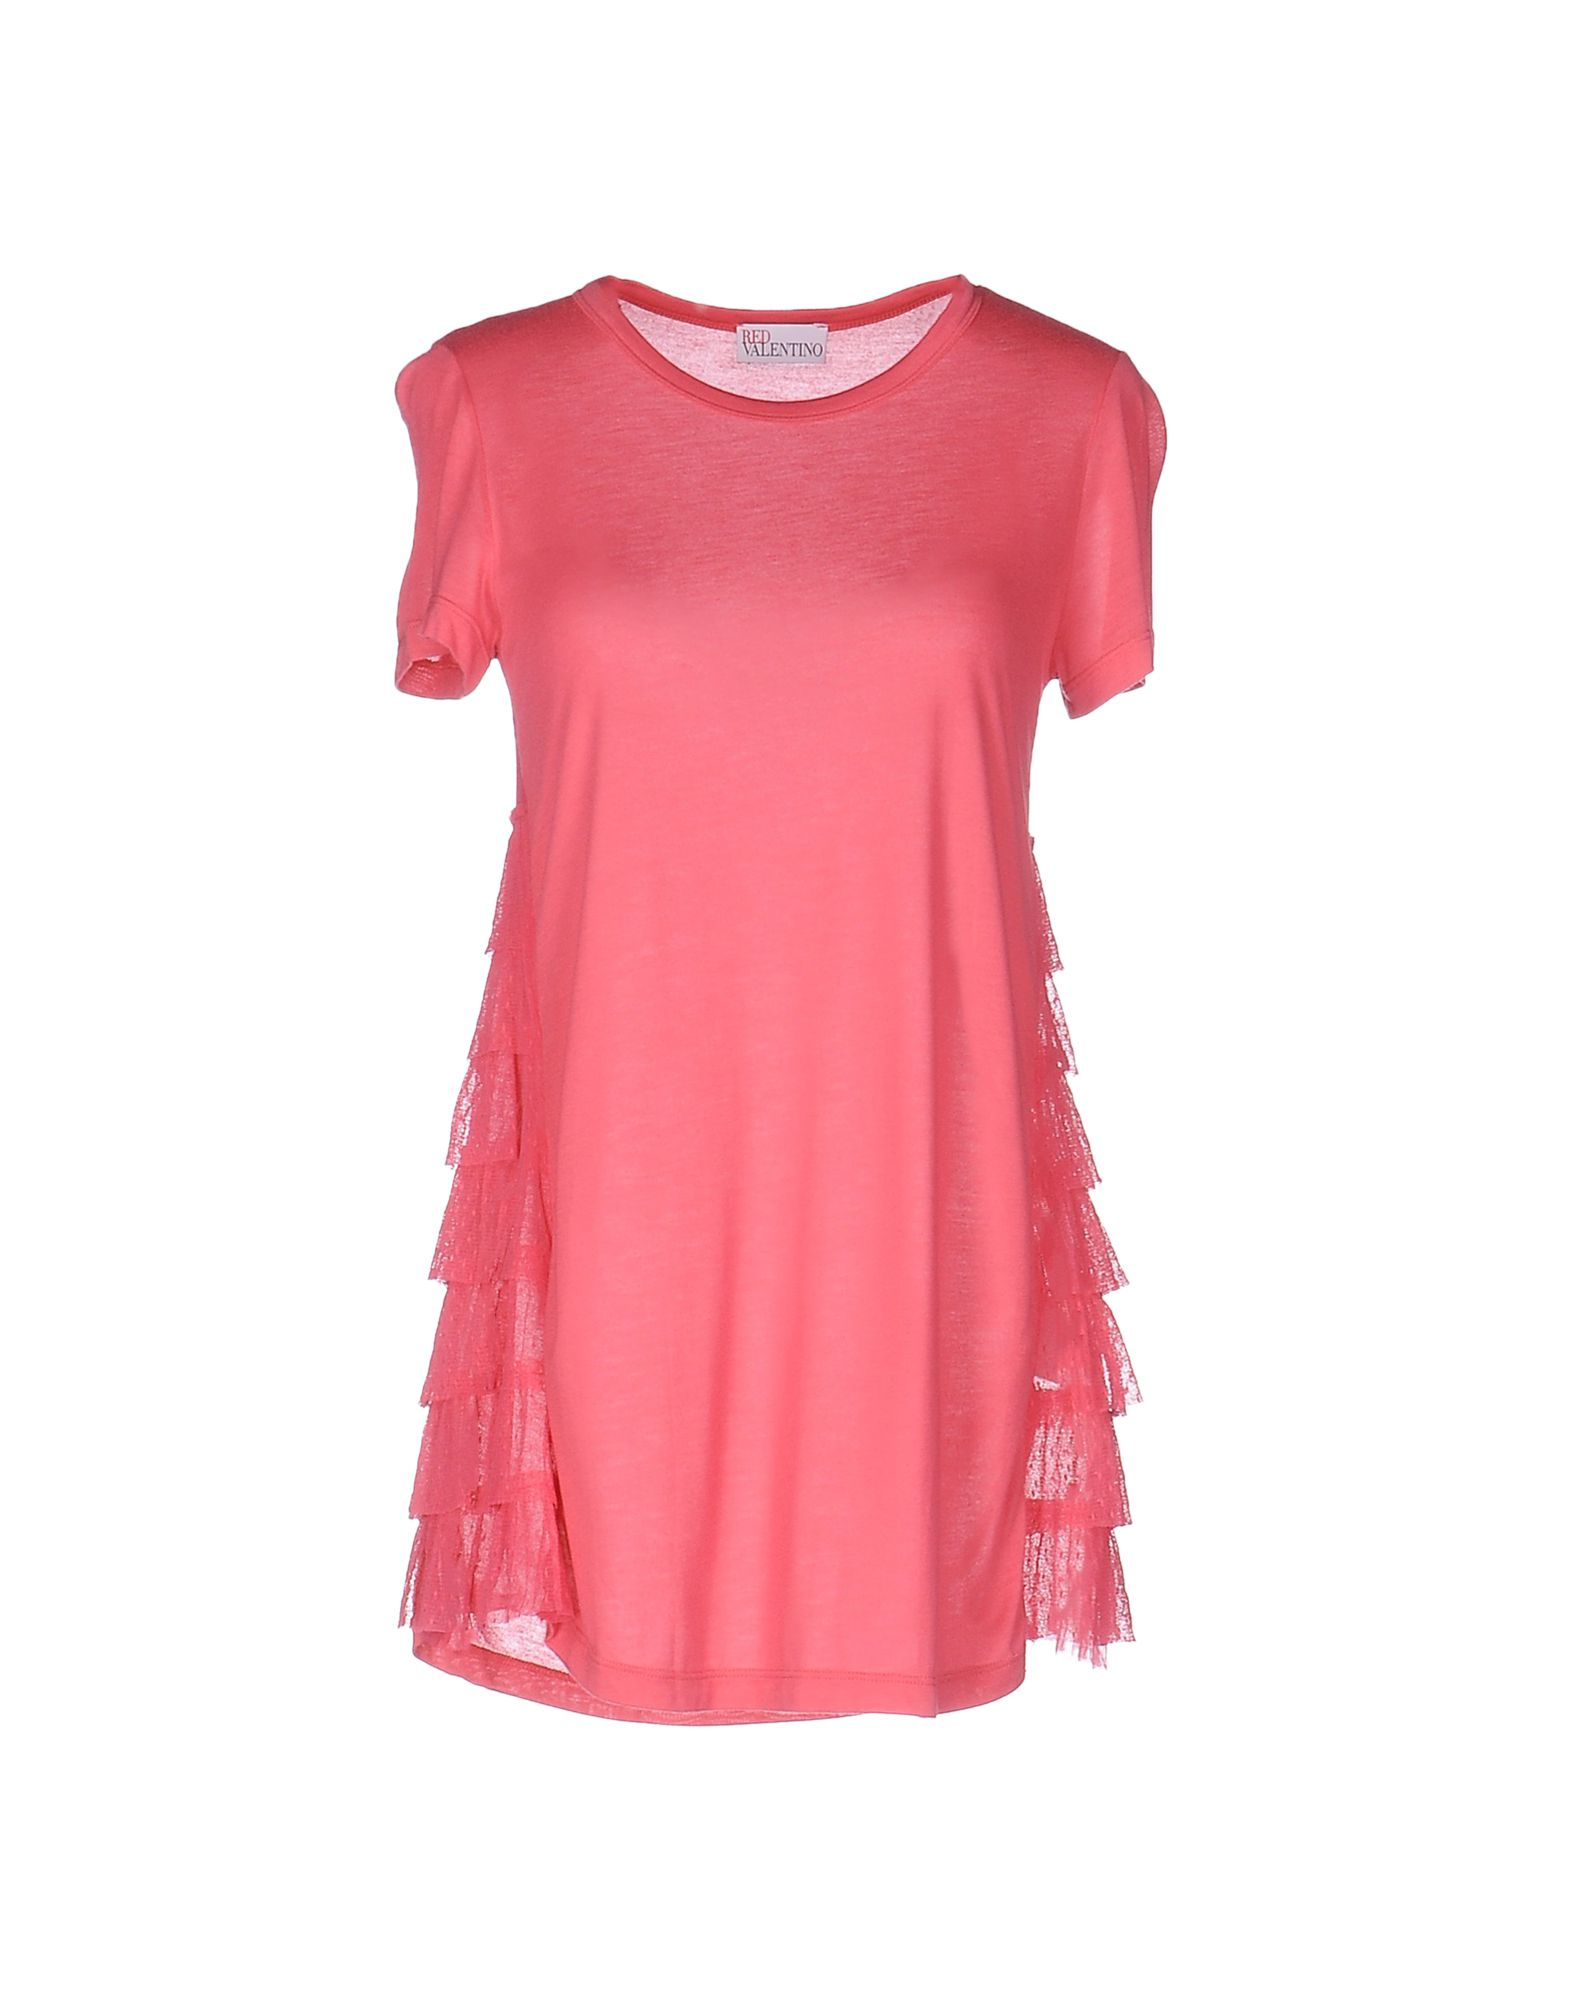 T-Shirt Redvalentino Donna - Acquista online su C81KAW6Q